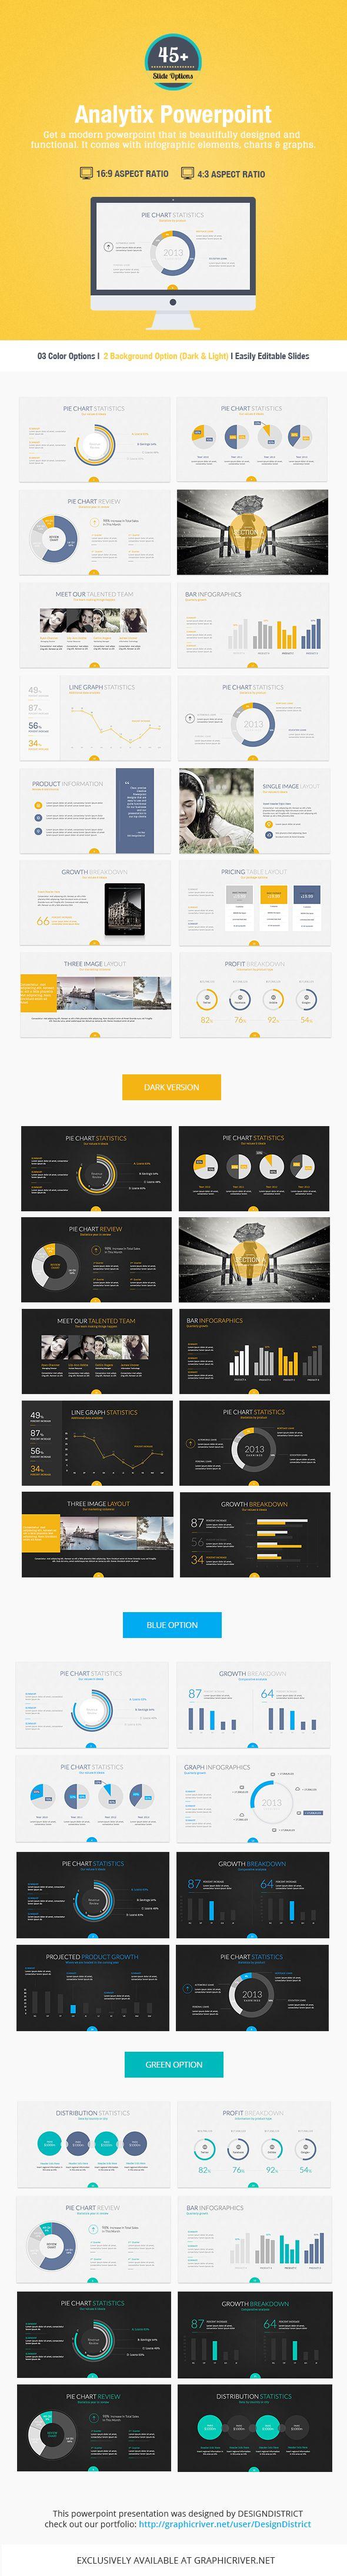 Analytix Powerpoint on Behance